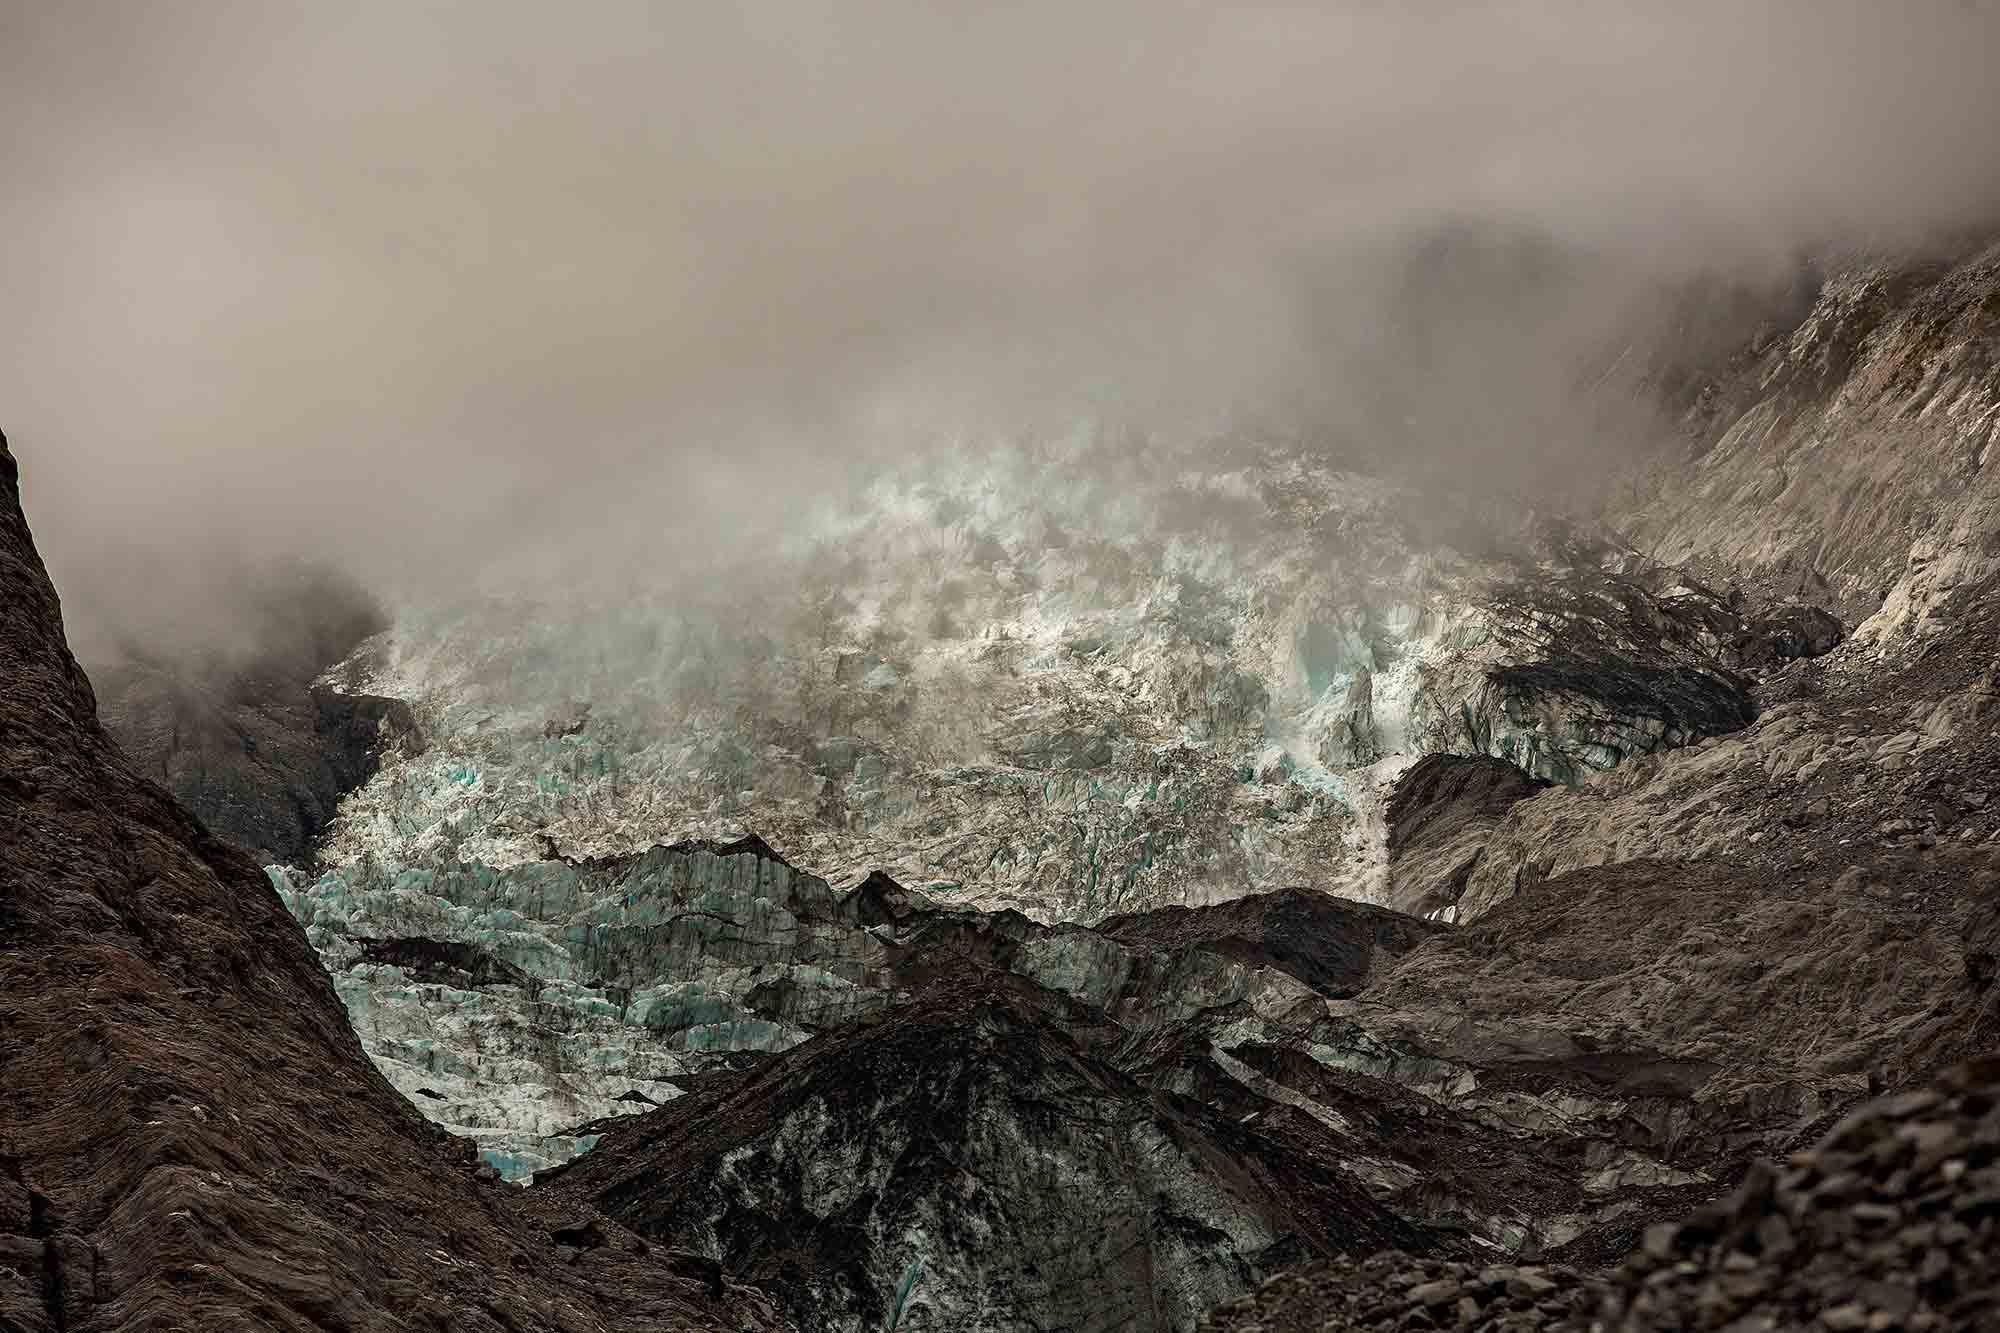 Franz Josef Glacier, New Zealand. © Ulli Maier & Nisa Maier